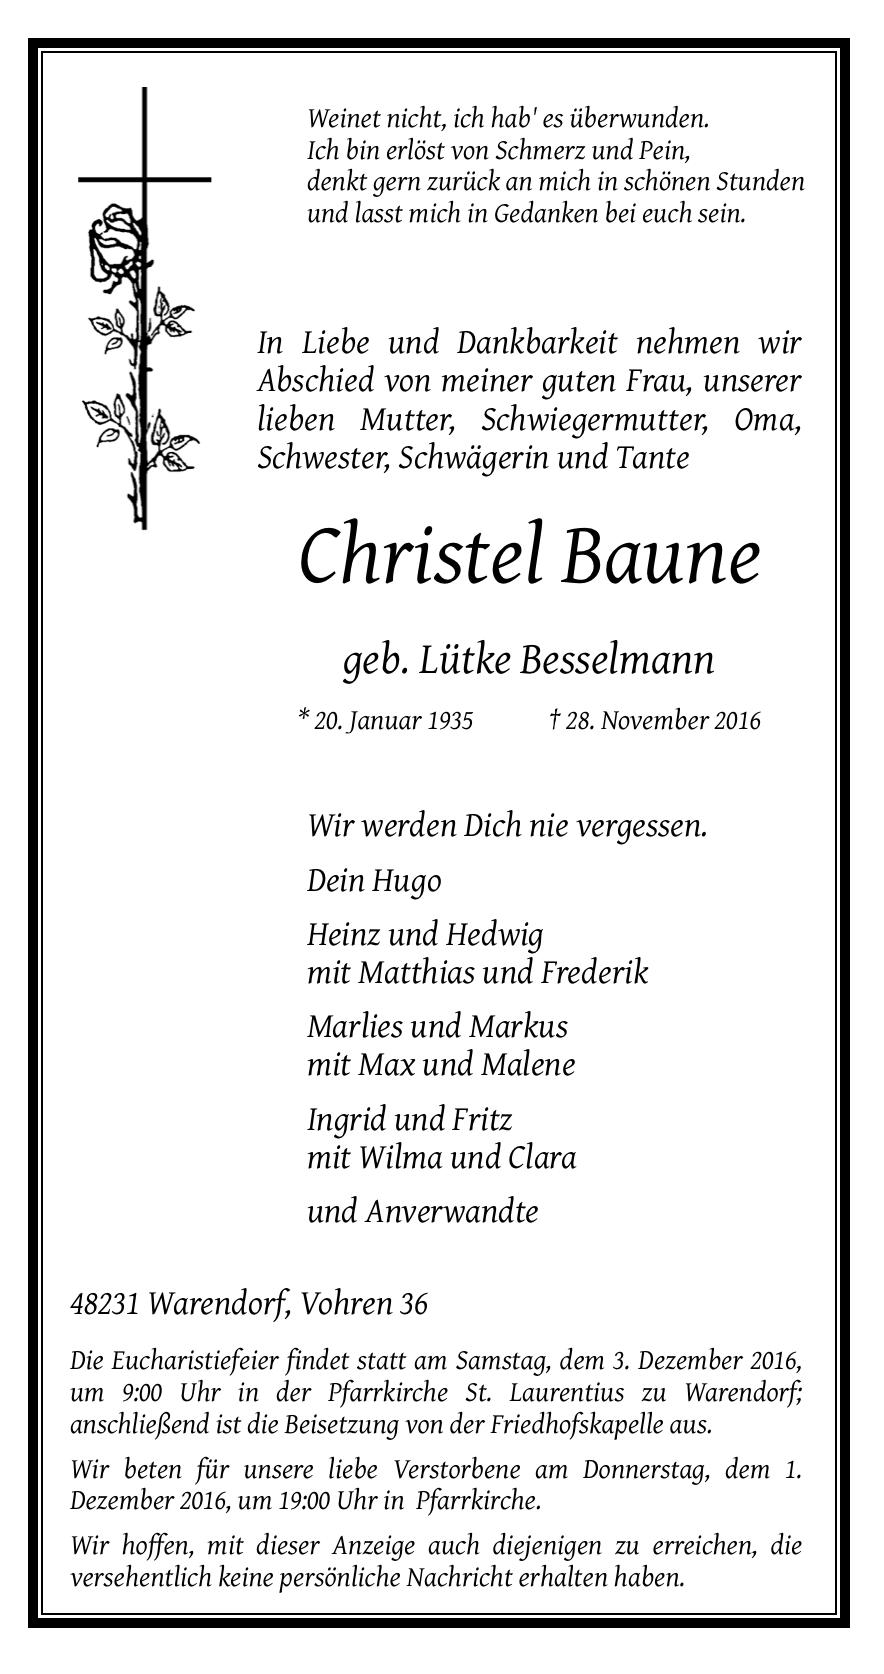 baune-christel